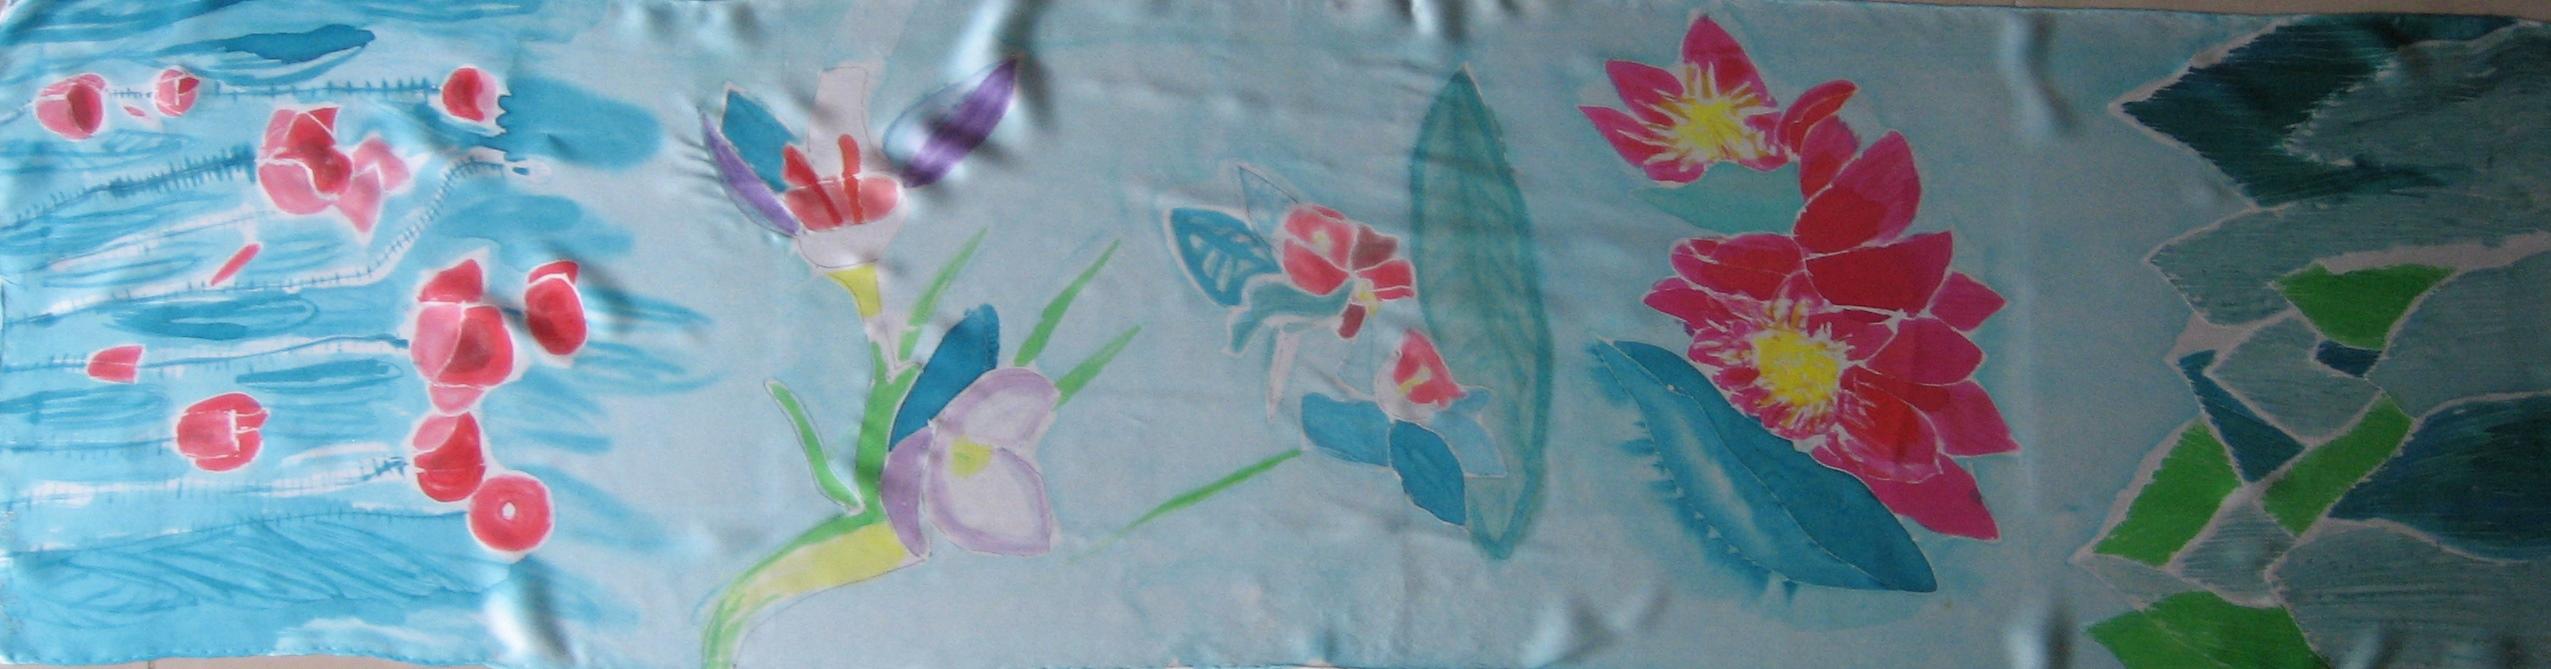 "Fular ""Mix flores Cote cabrera"", crepe satin 180 x 45 cm."